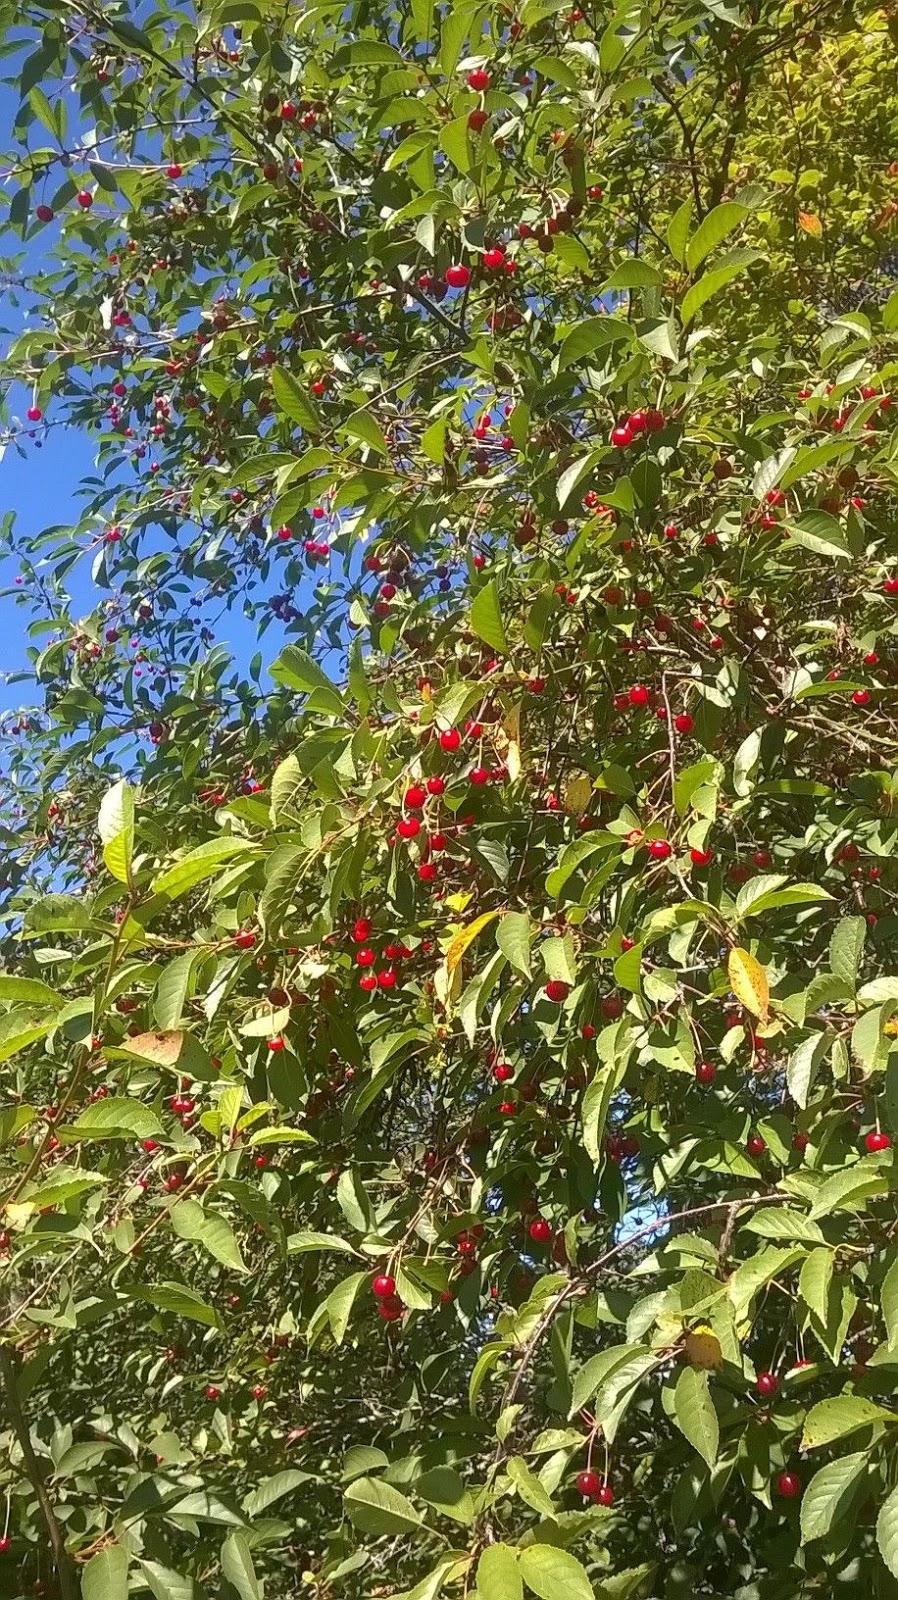 Kirsikkamehu